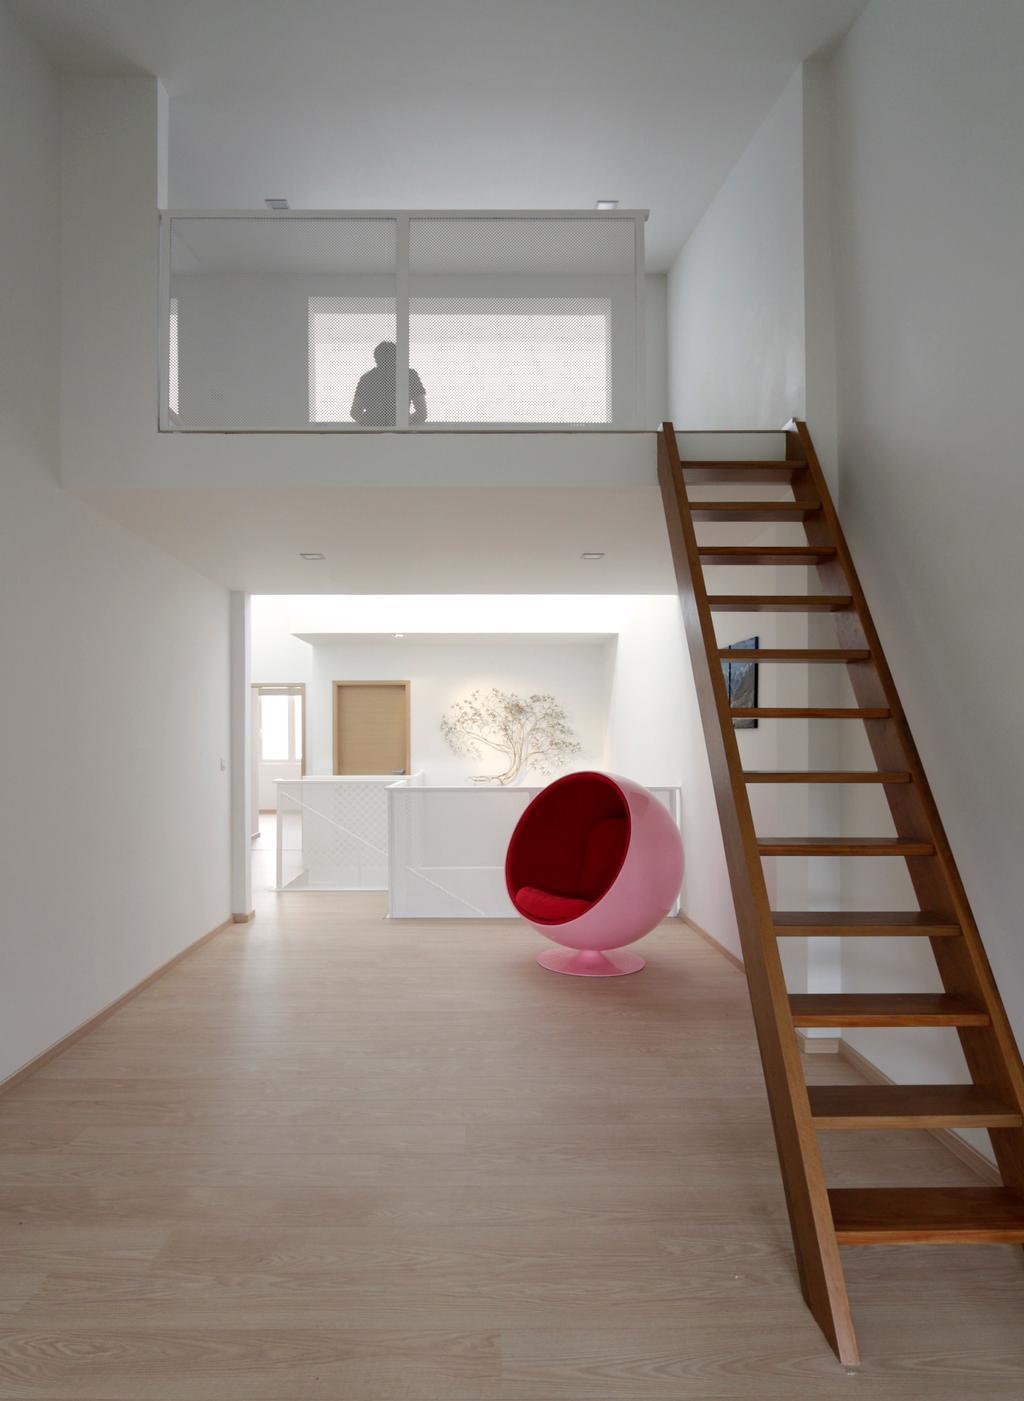 Minimalistic, Landed, Lentor Green, Architect, EHKA Studio, Banister, Handrail, Staircase, Hardwood, Wood, Chair, Furniture